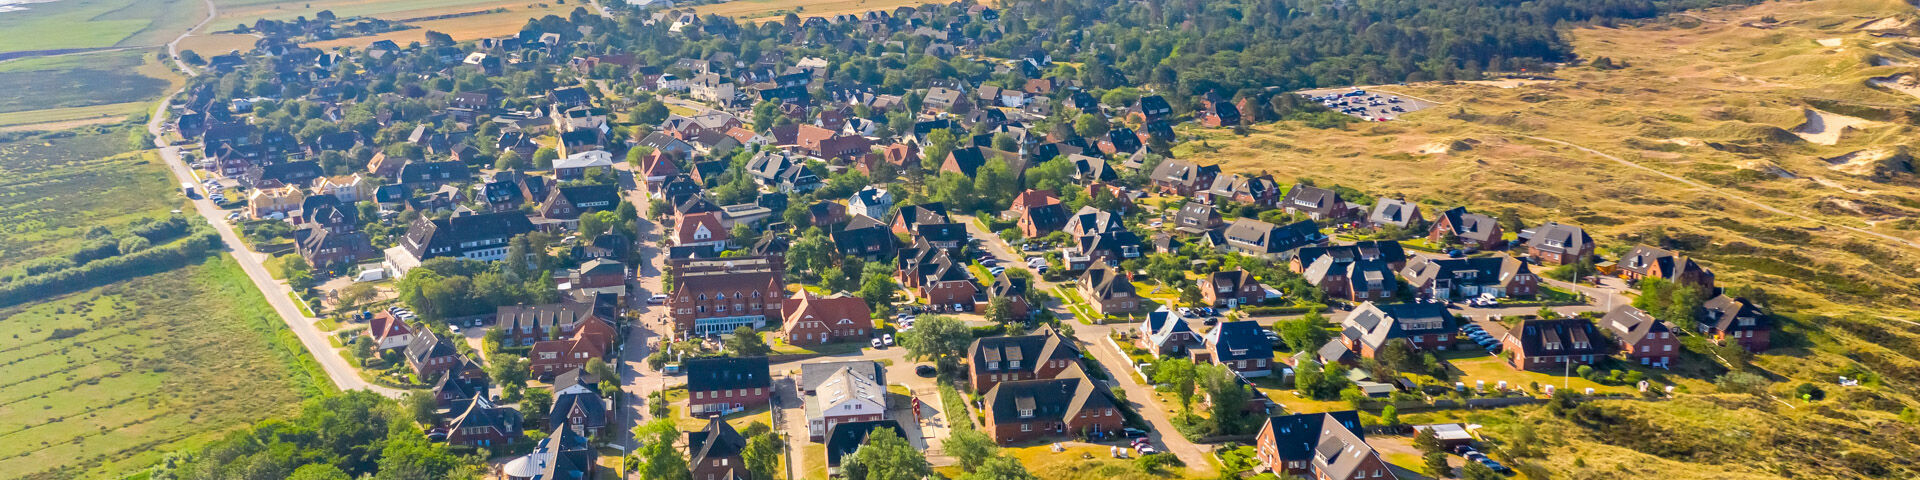 Norddorf auf Amrum